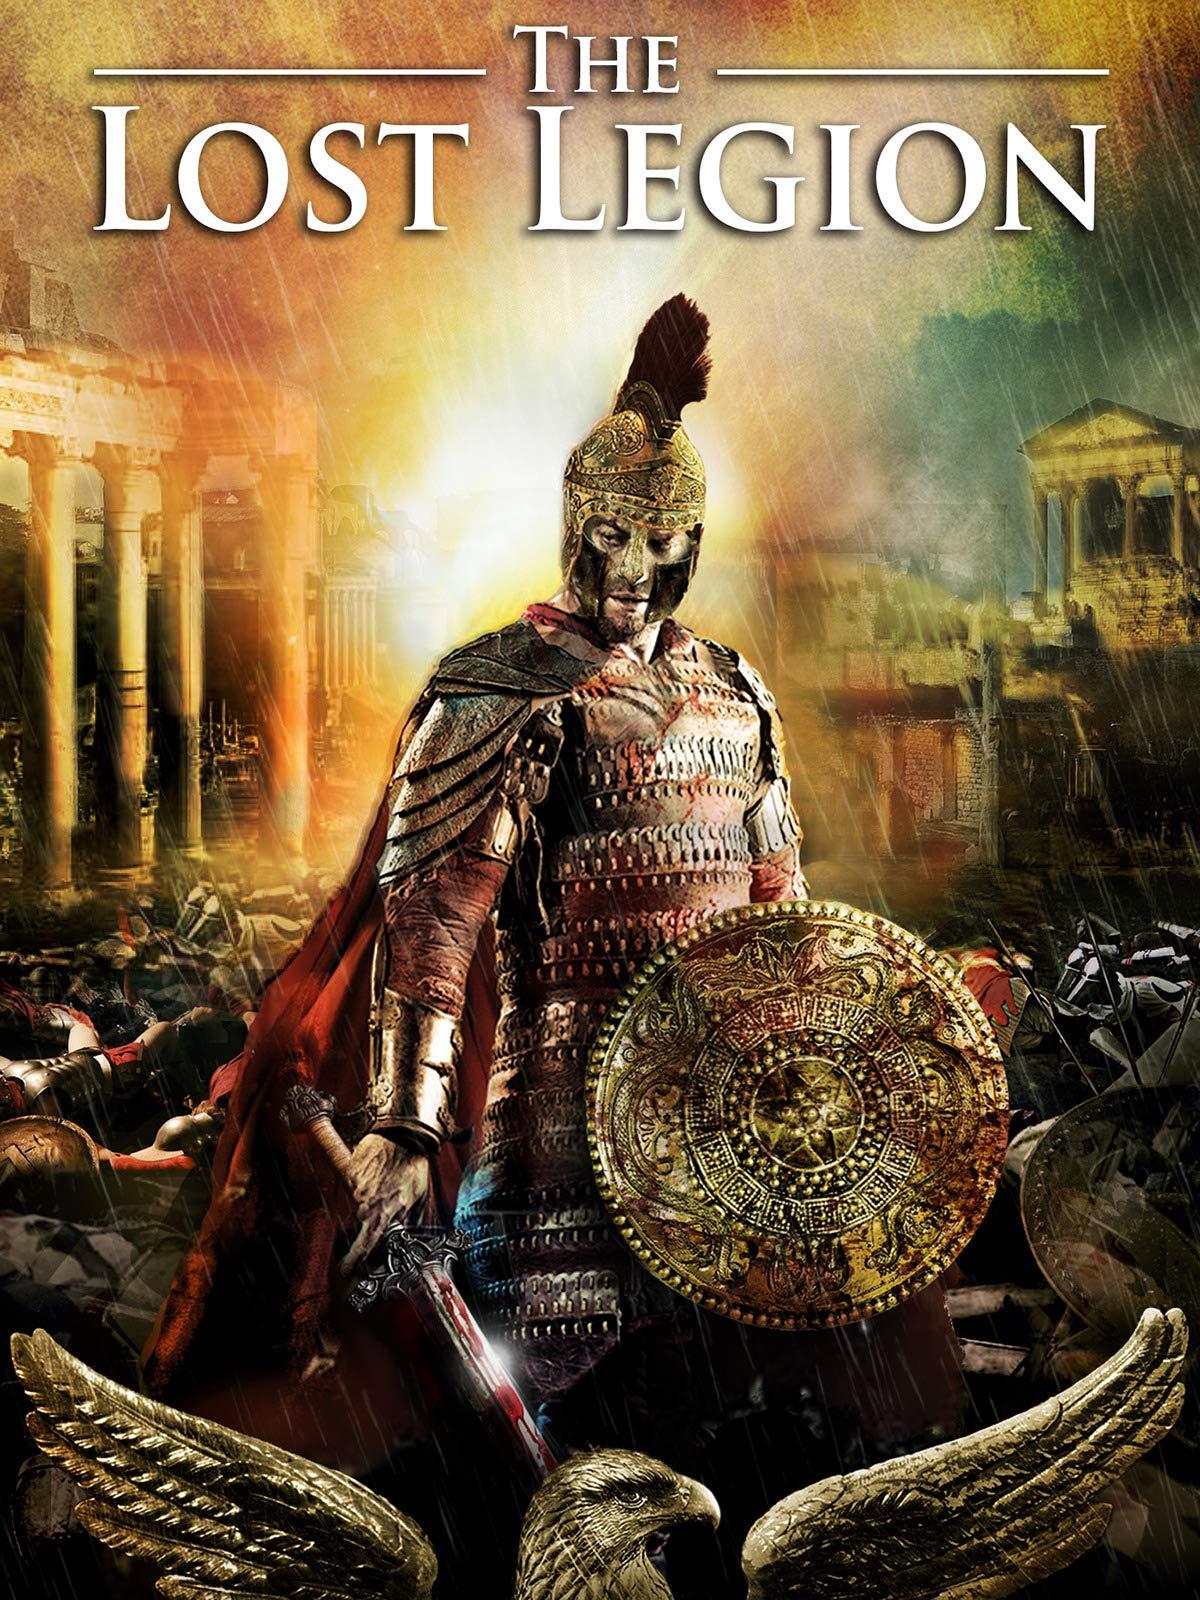 The Lost Legion